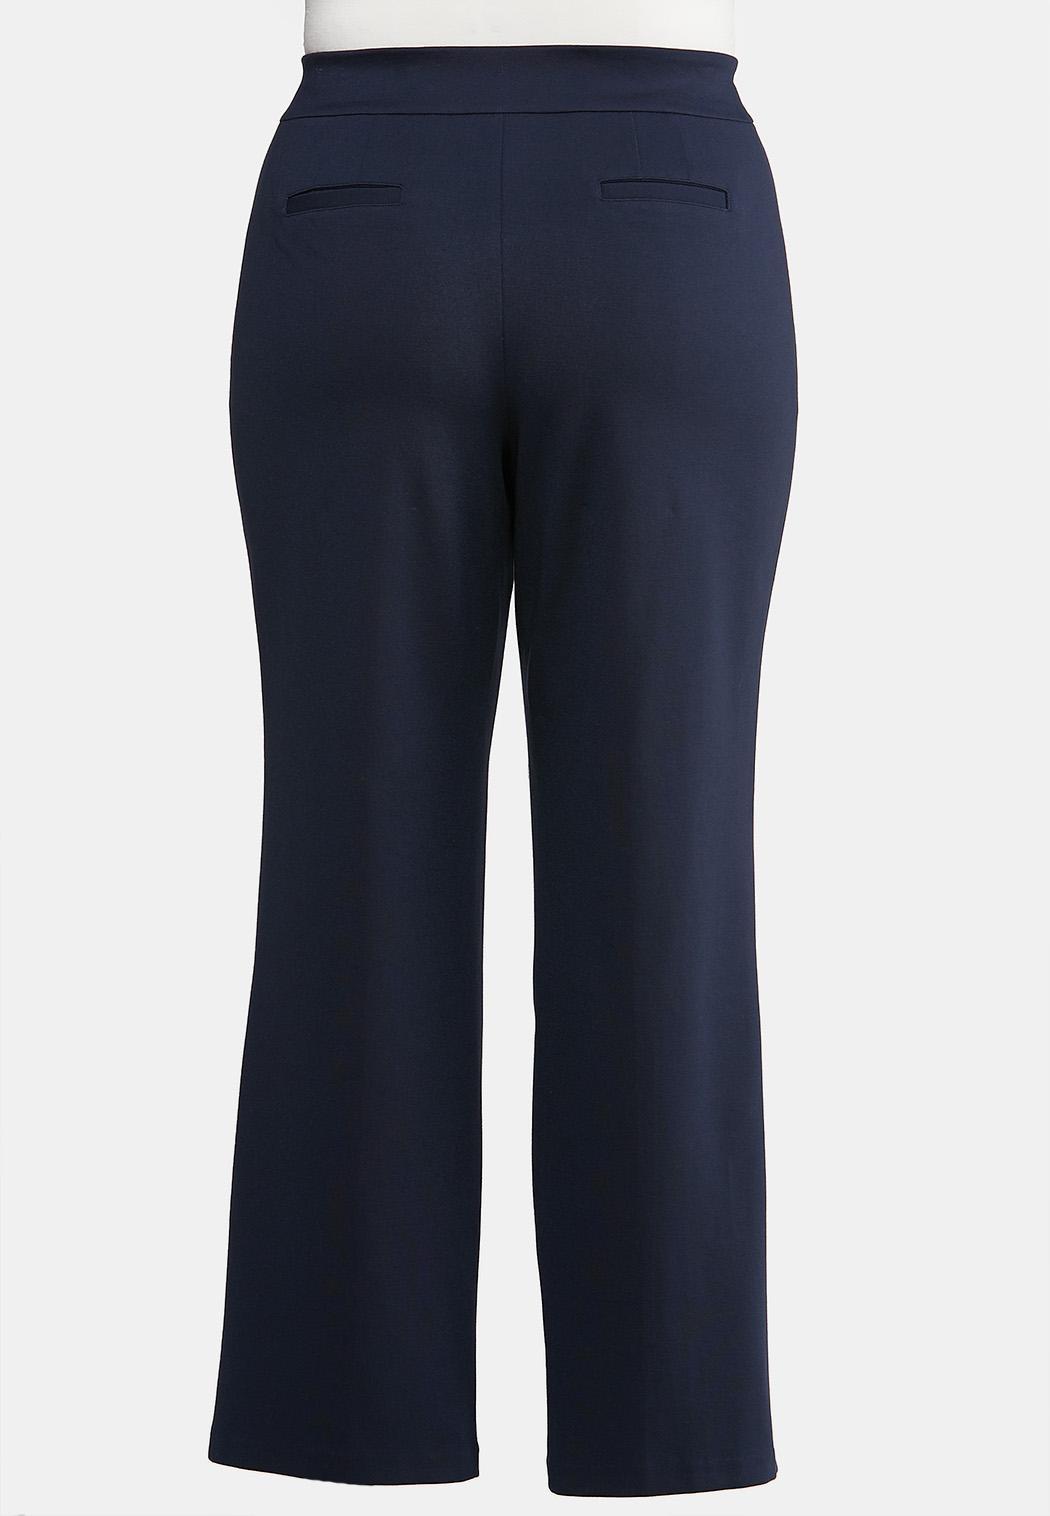 Plus Petite Straight Leg Ponte Pants (Item #43919062)